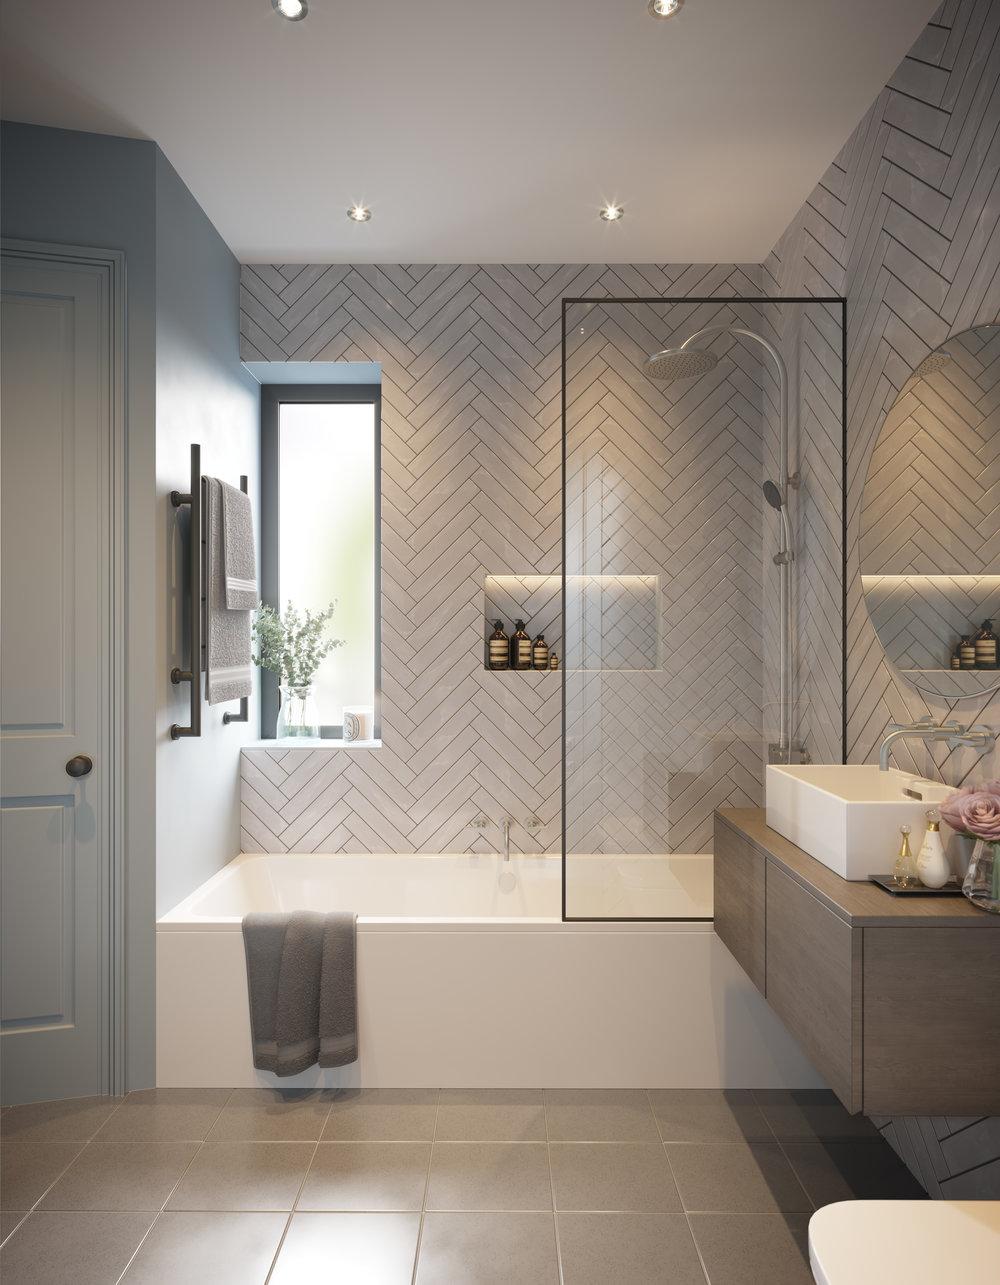 MDC053_Belfast_V02_Bathroom_FINAL_JPEG.jpg